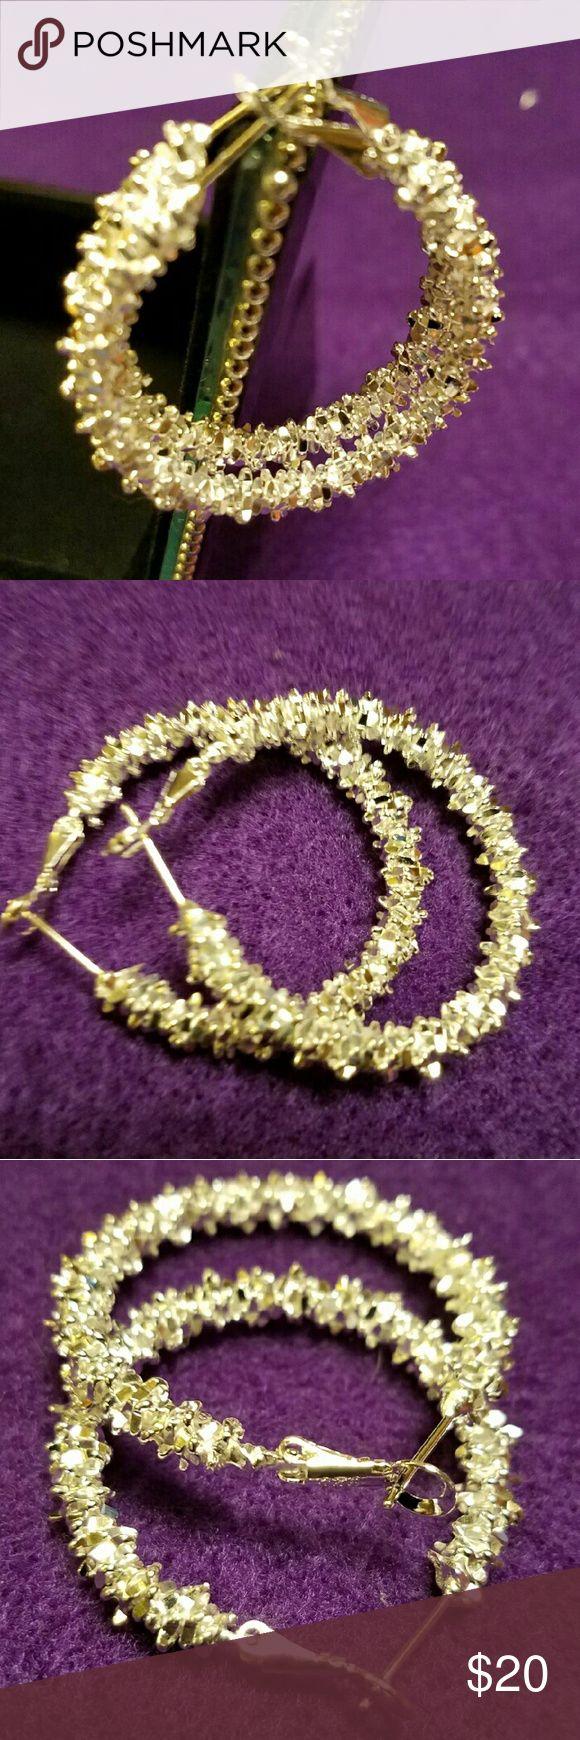 Silver 15 Inch Hoop Pierced Earring Nwot Costume Jewelryhope Costumesearringssilver